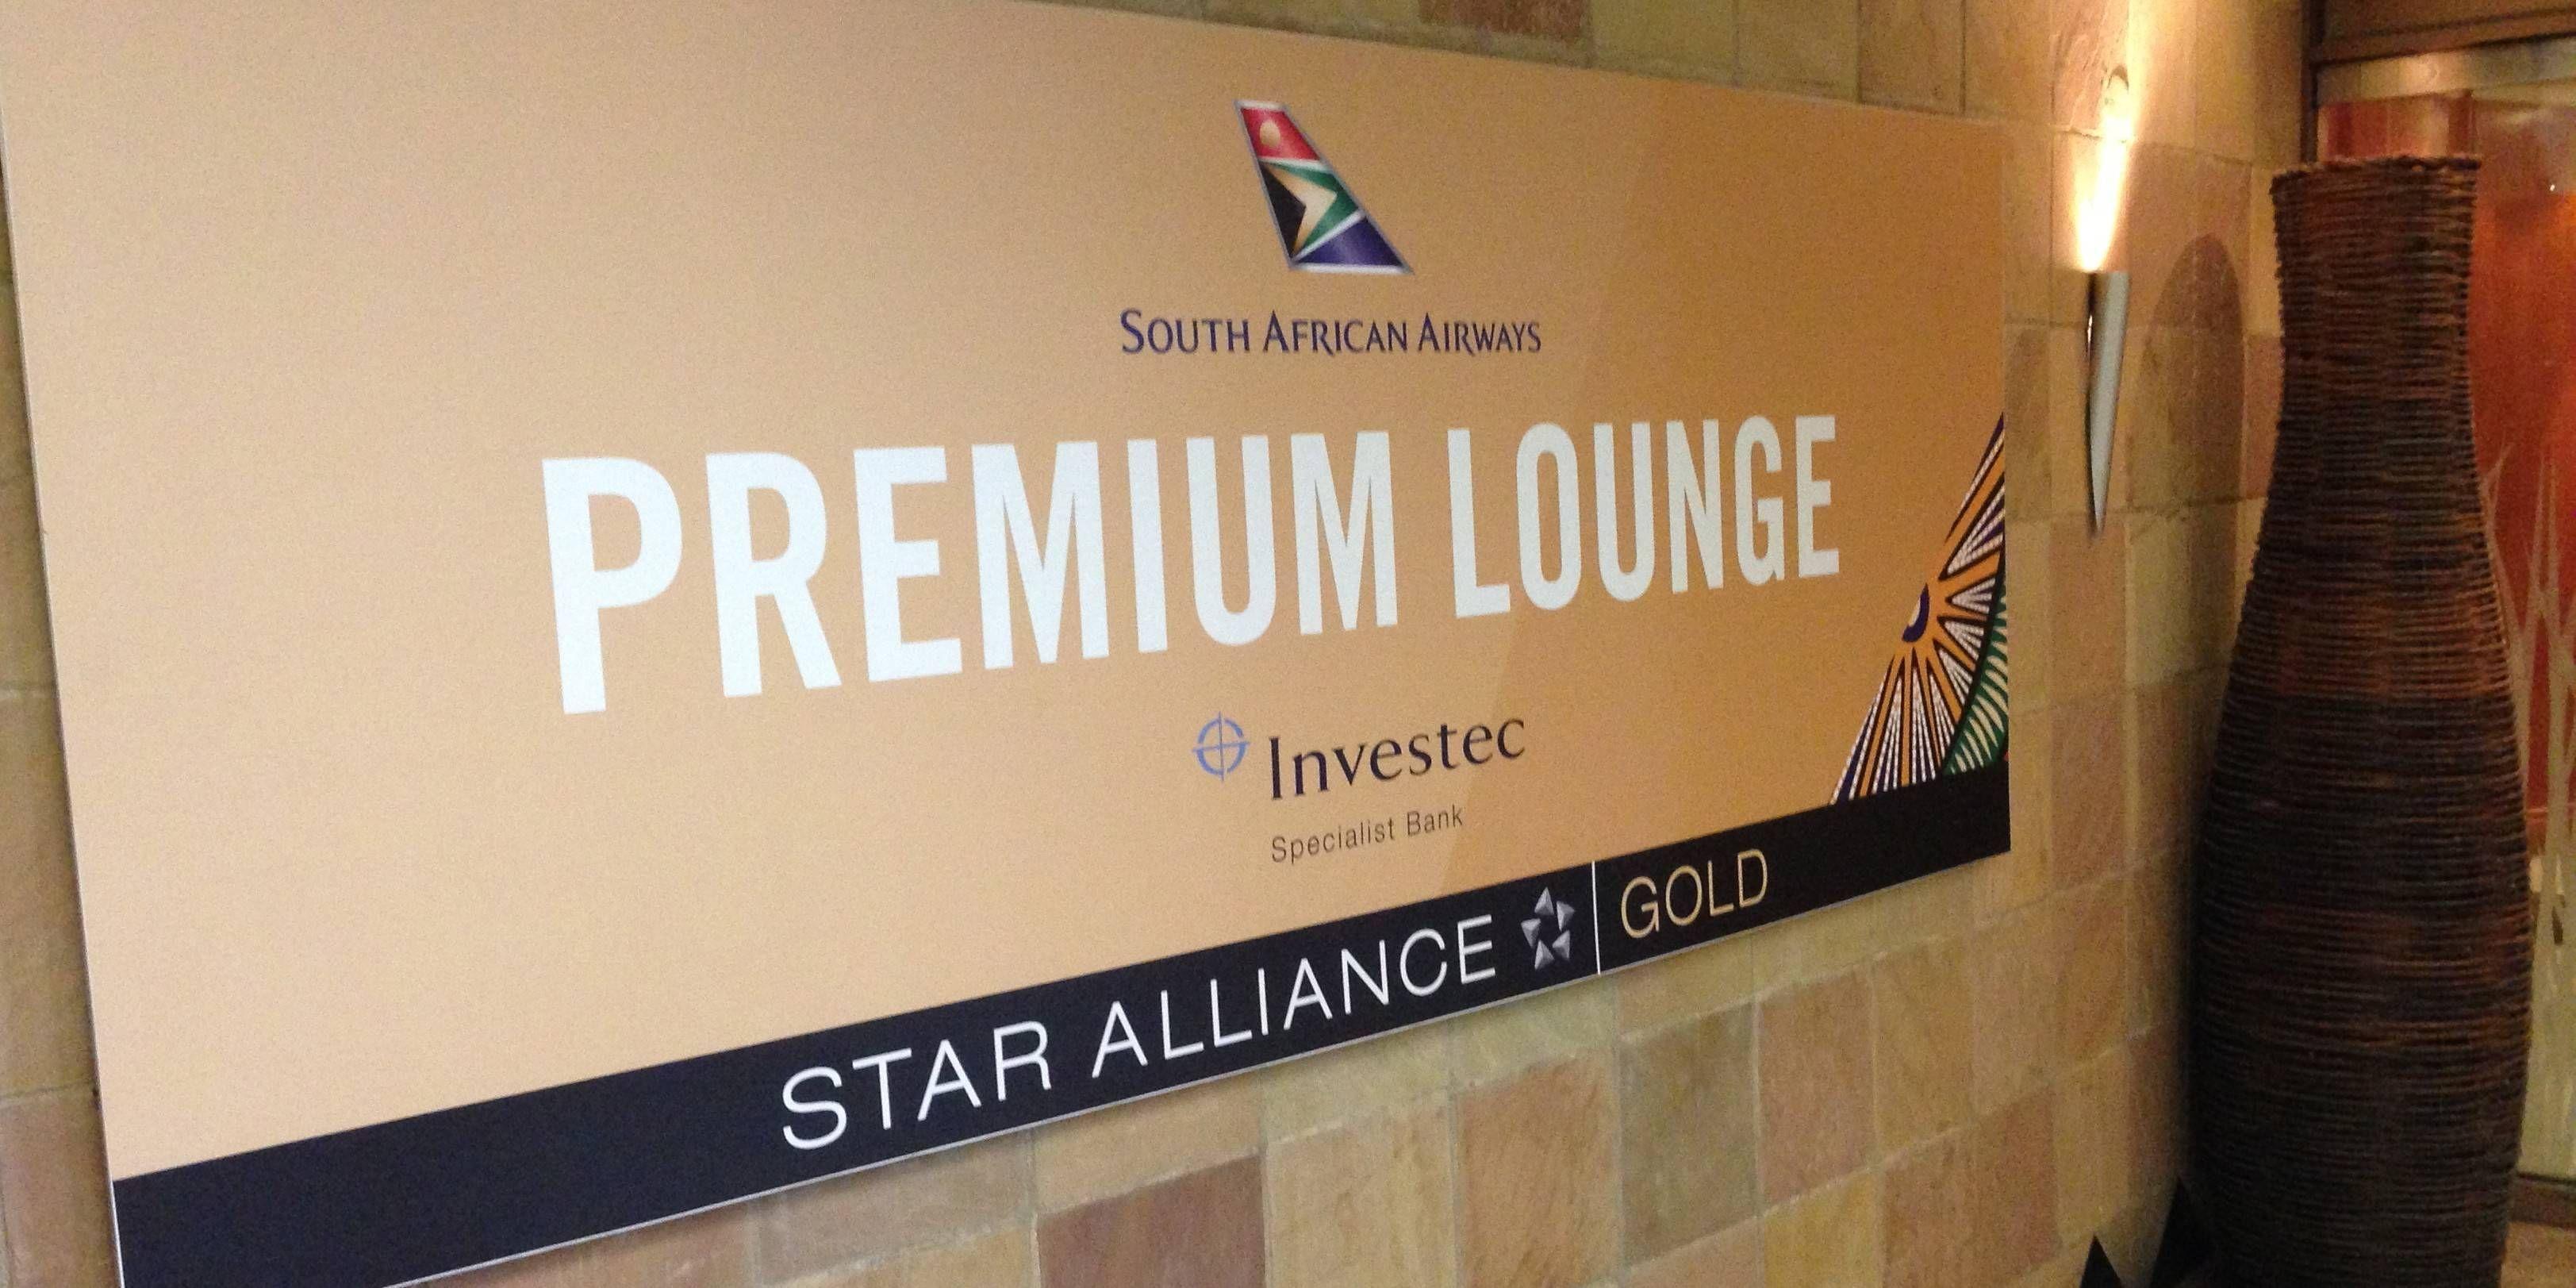 Premium Lounge South African Airways no Aeroporto de Johannesburgo (JNB)